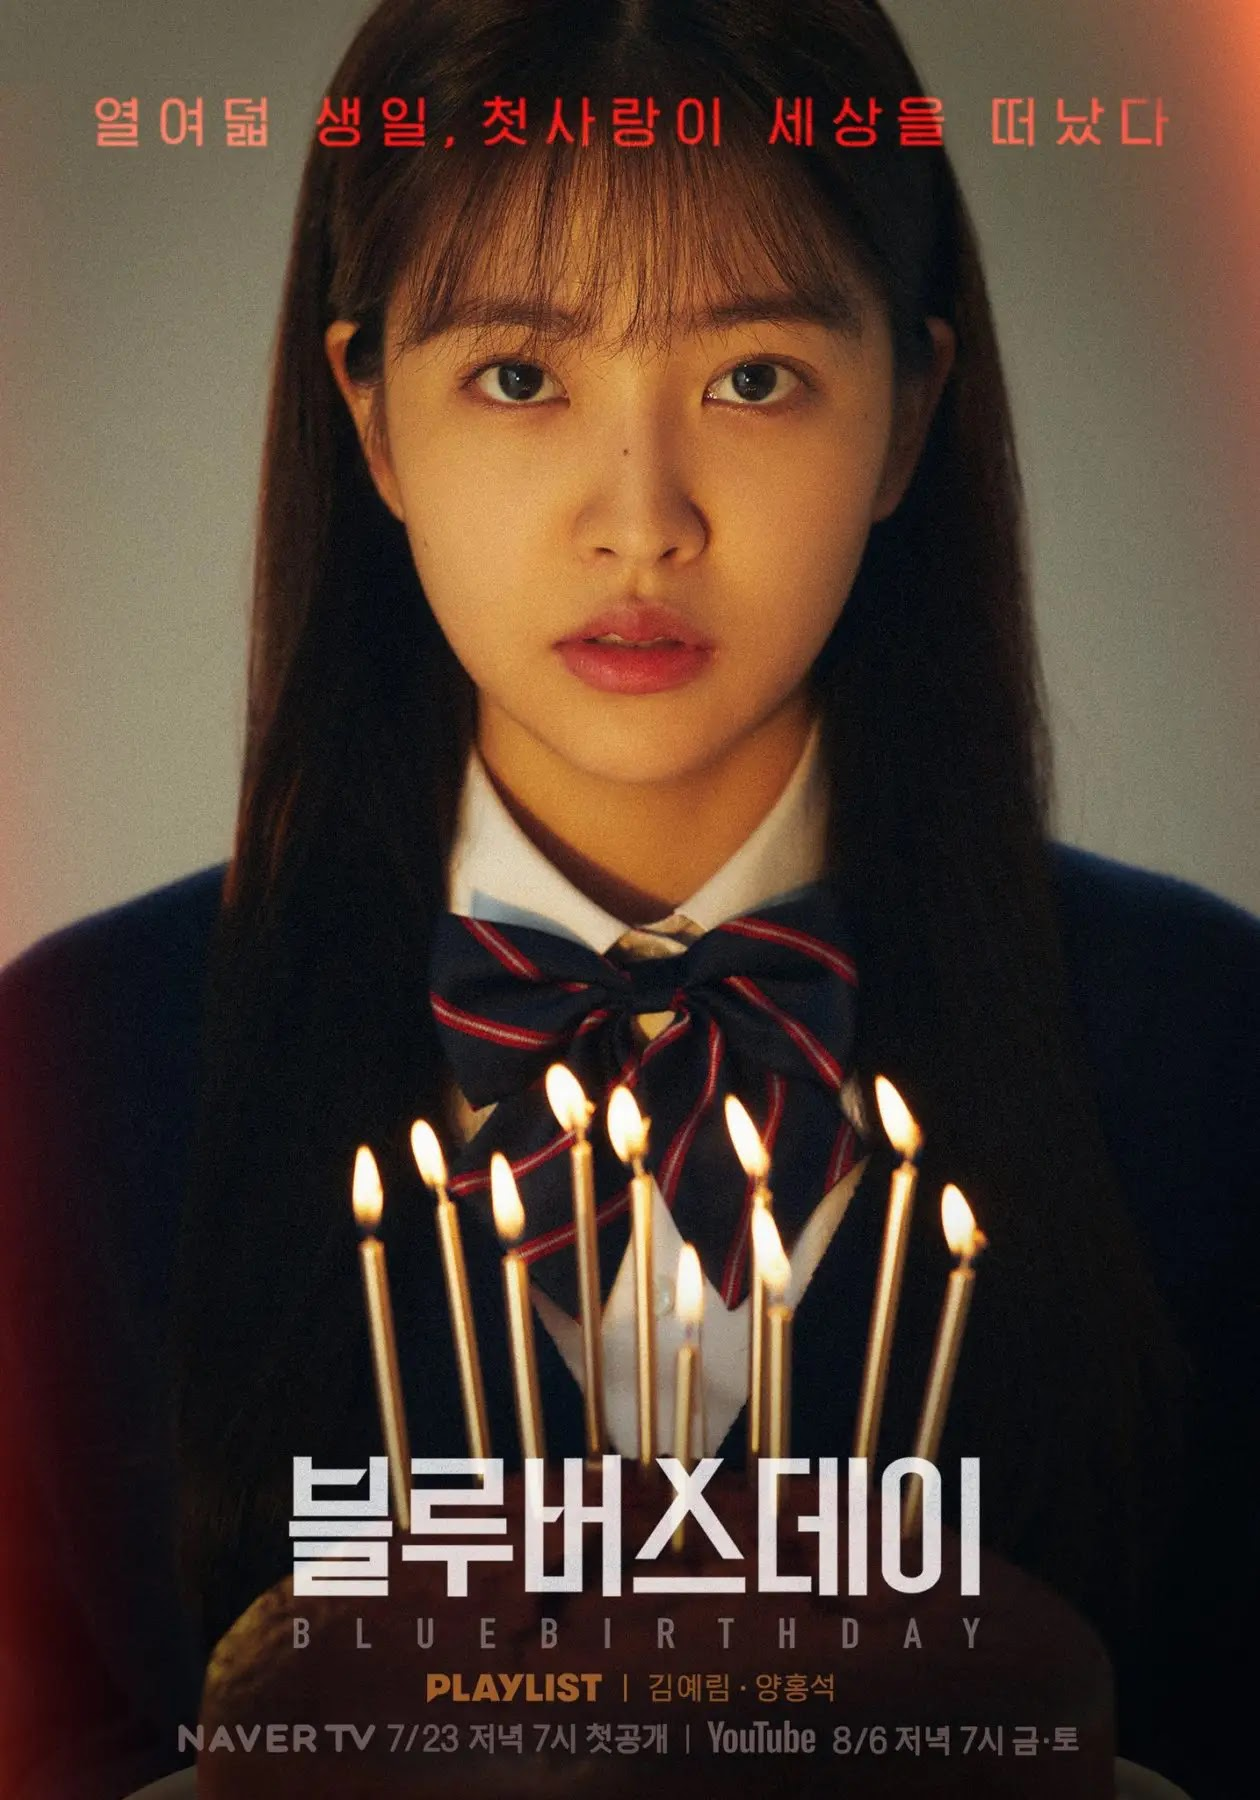 Peek at The Appearance of Red Velvet's Yeri and PENTAGON's Hongseok on The Web Drama 'Blue Birthday'